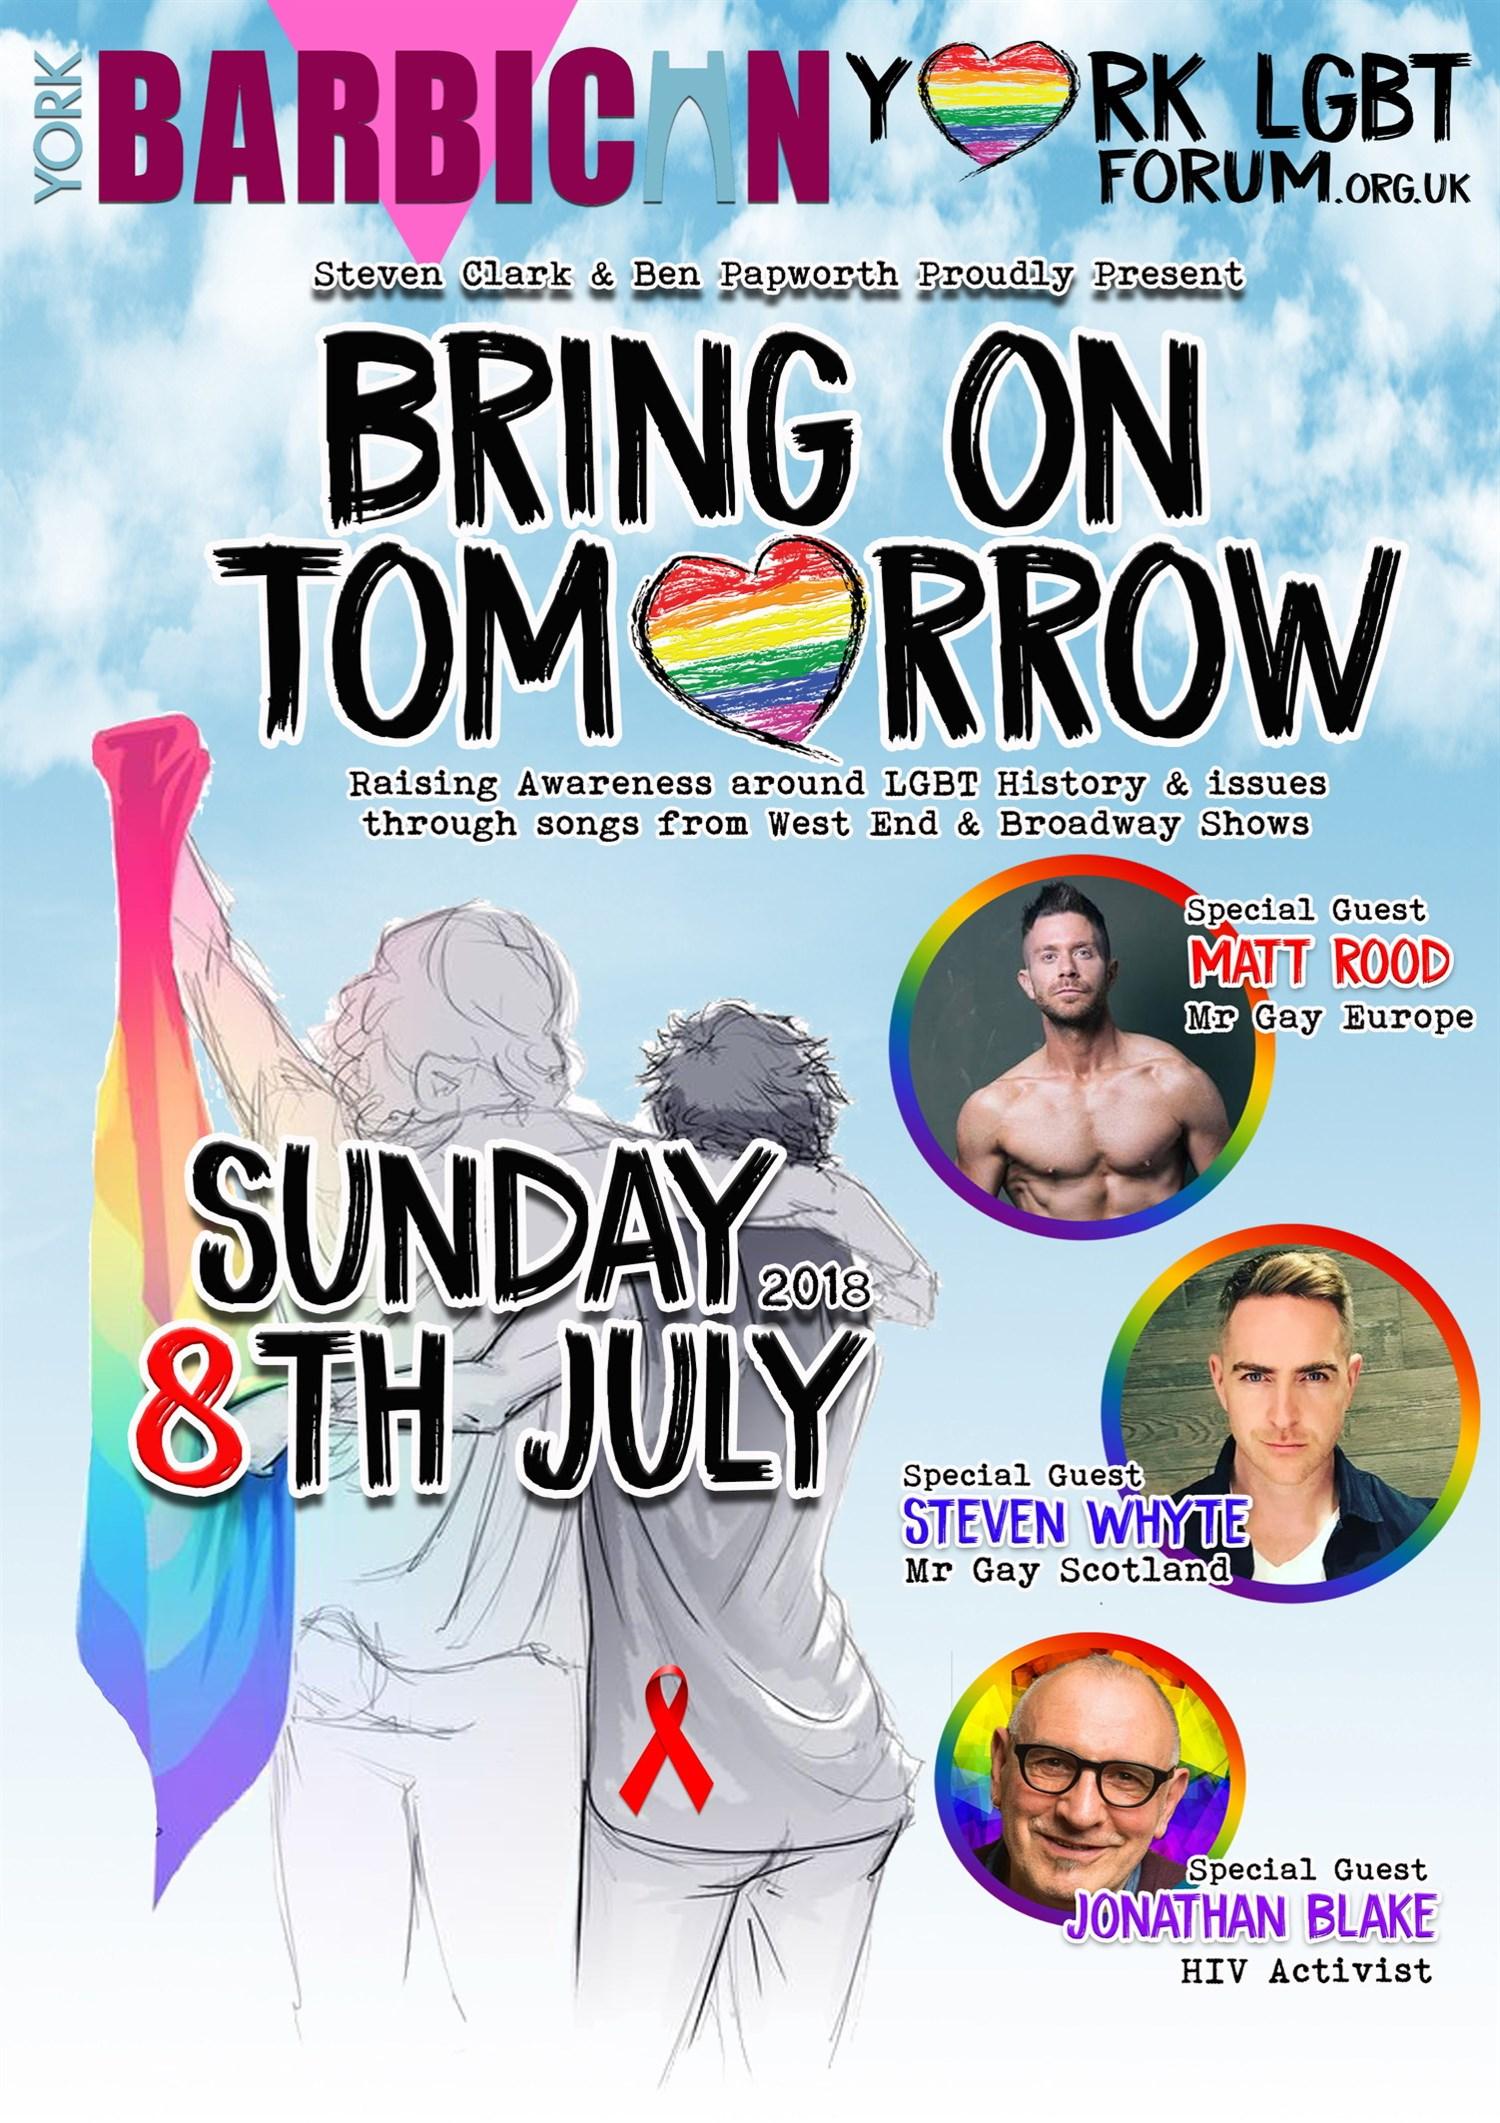 Gay youth forum uk